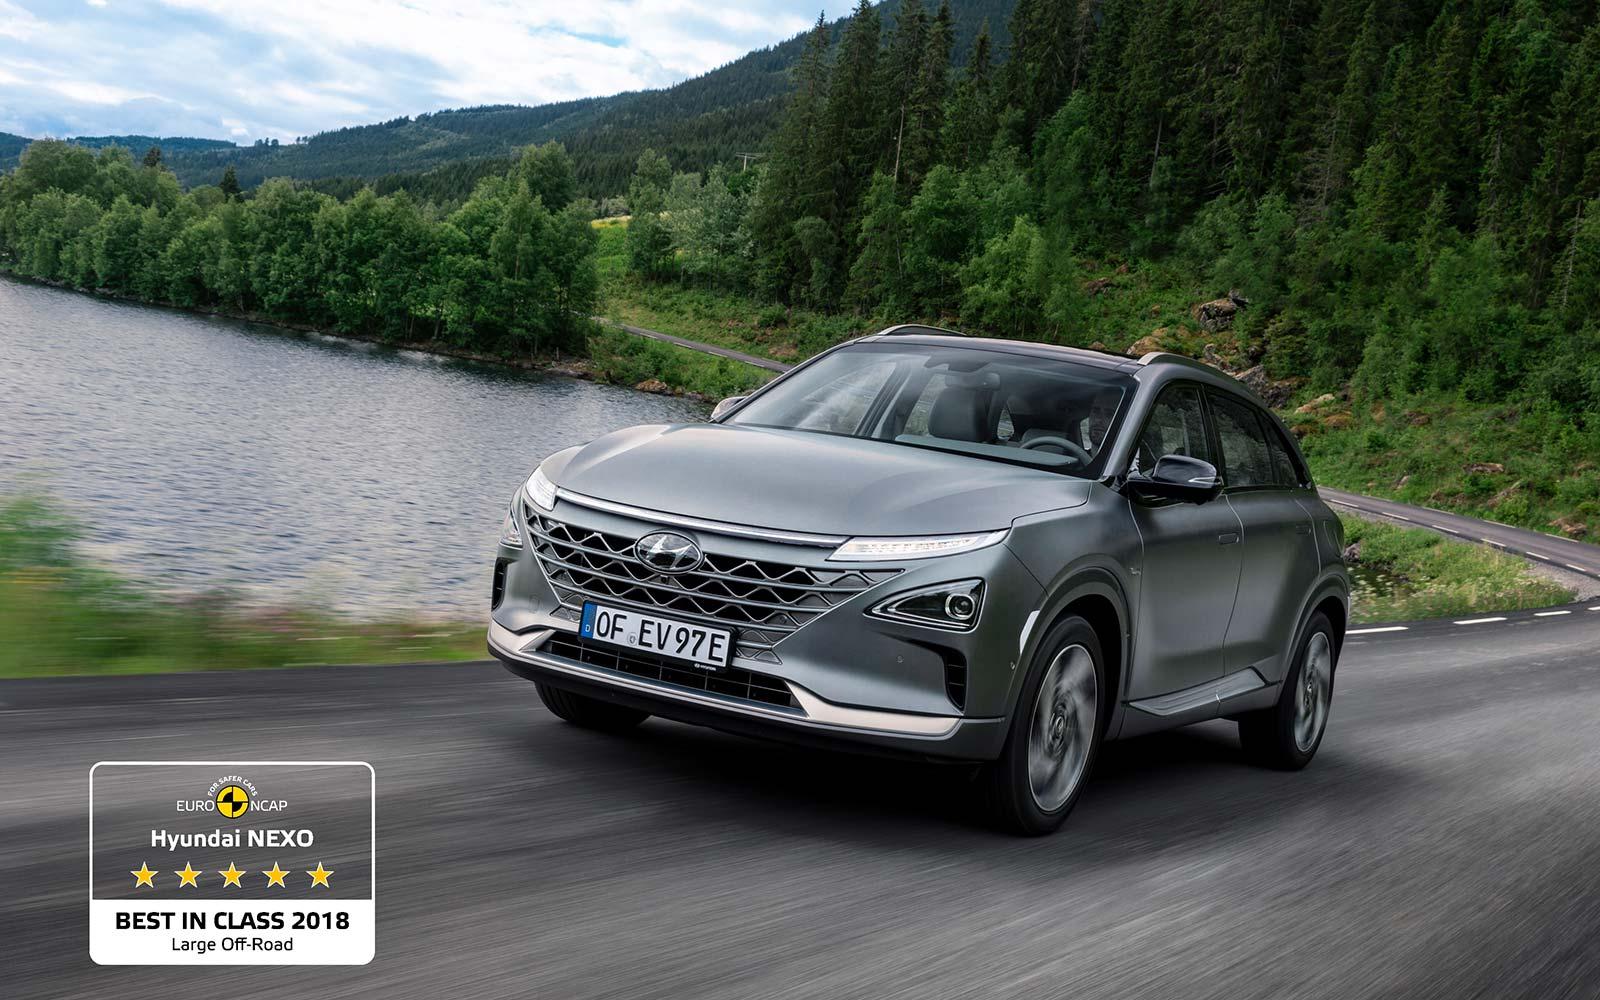 Hyundai NEXO Best in Class 2018